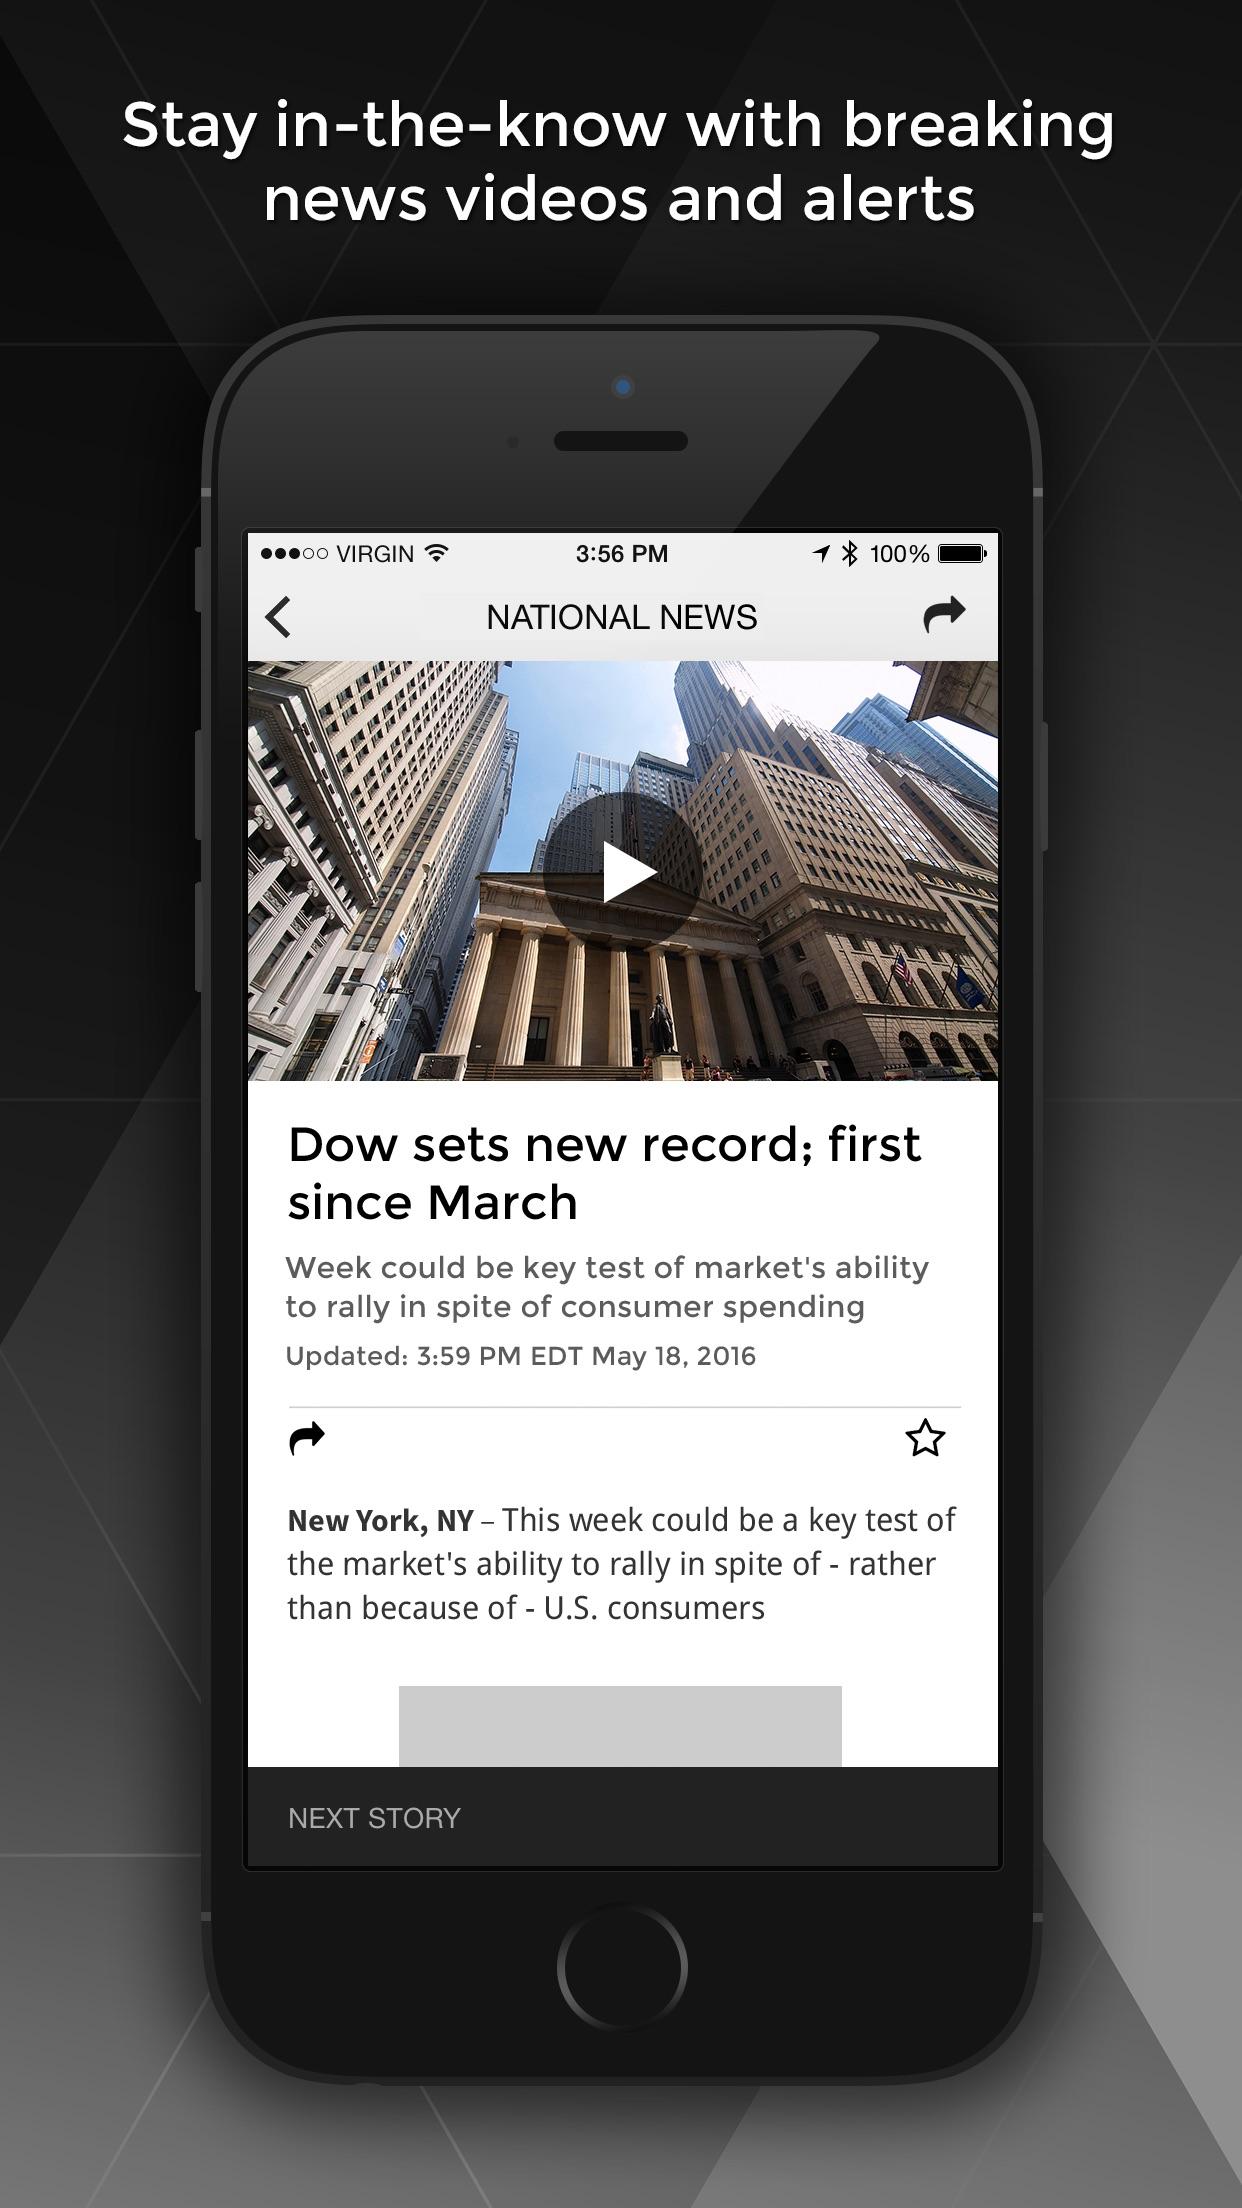 WXII 12 News - Piedmont Triad News and Weather Screenshot